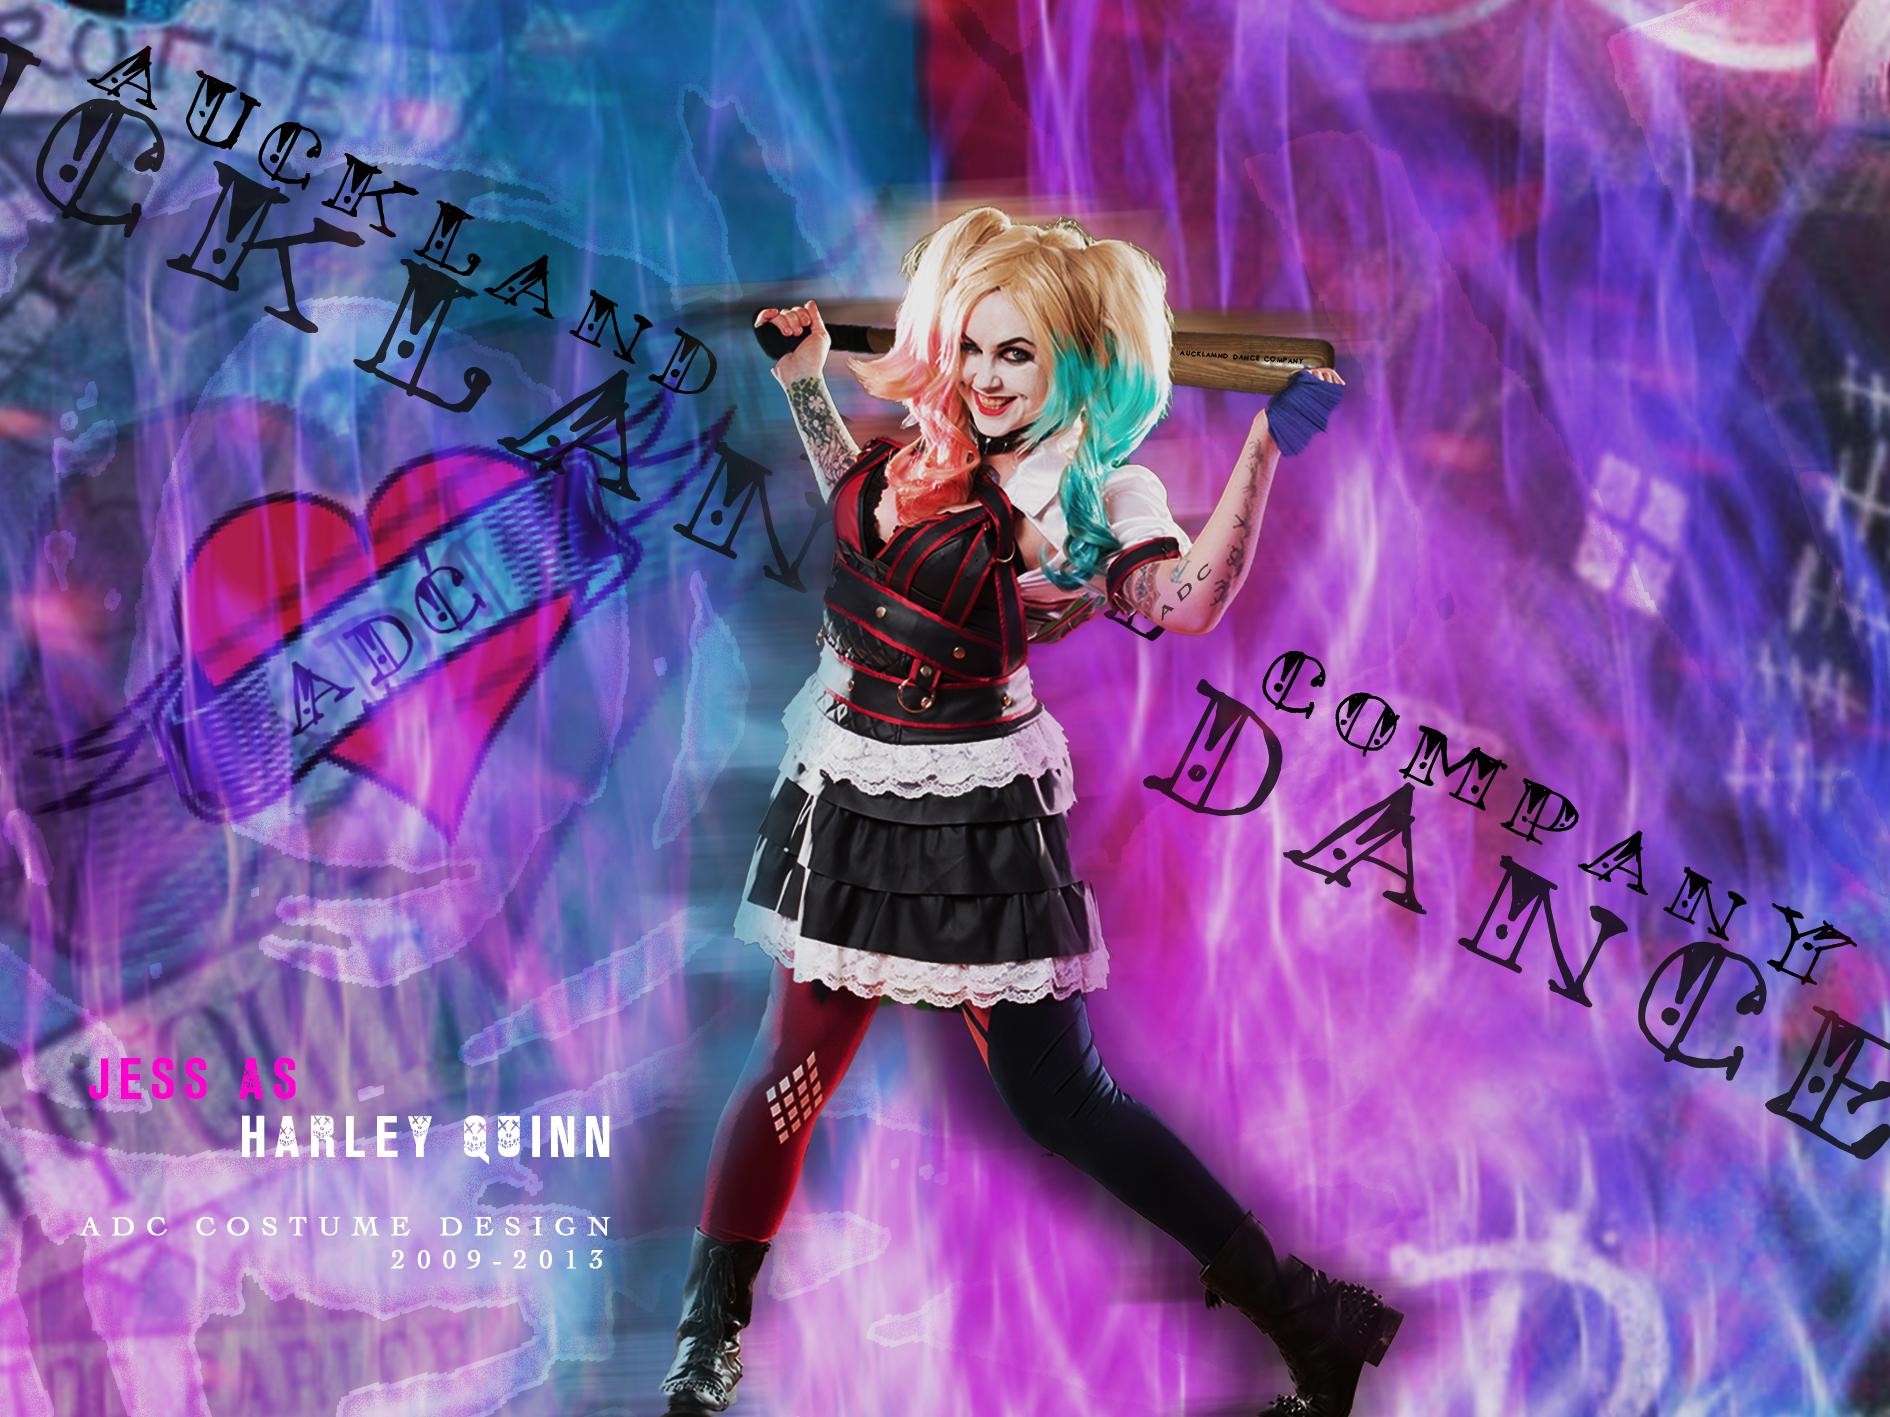 JESS(Costume Design) as HARLEY QUINN